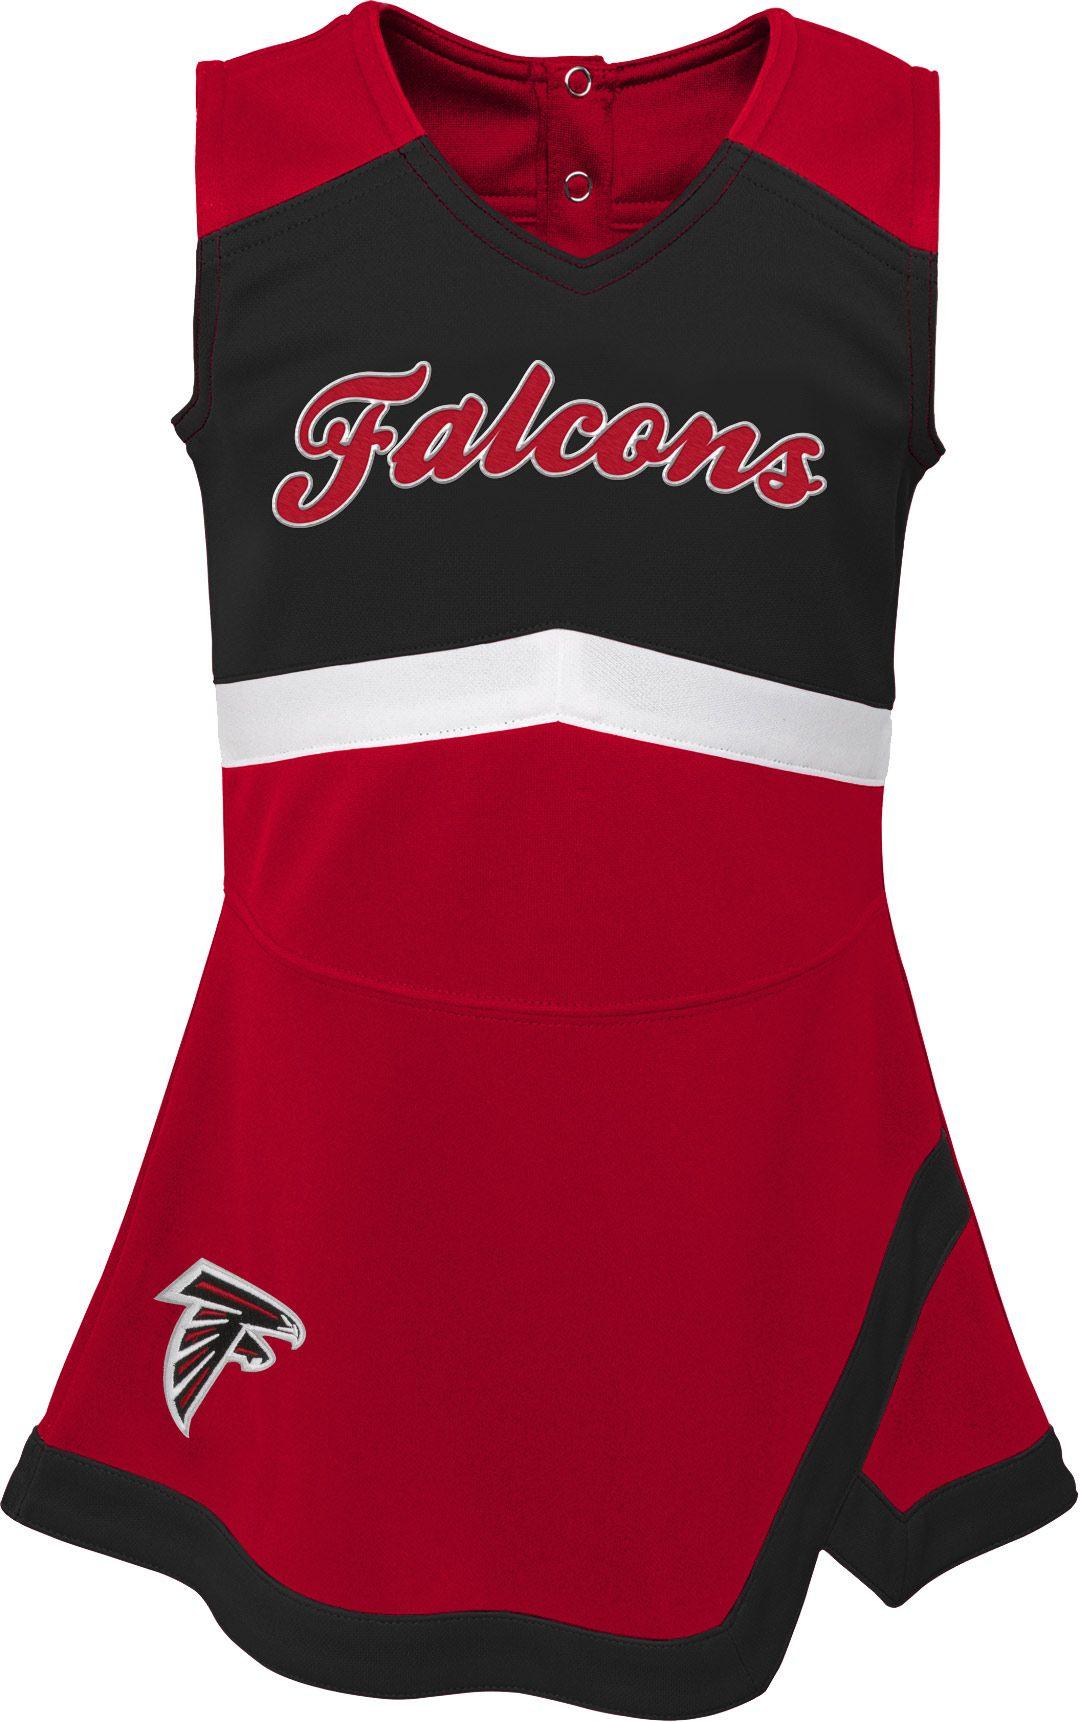 new style 2230c 12abf NFL Team Apparel Toddler Atlanta Falcons Cheer Jumper Dress